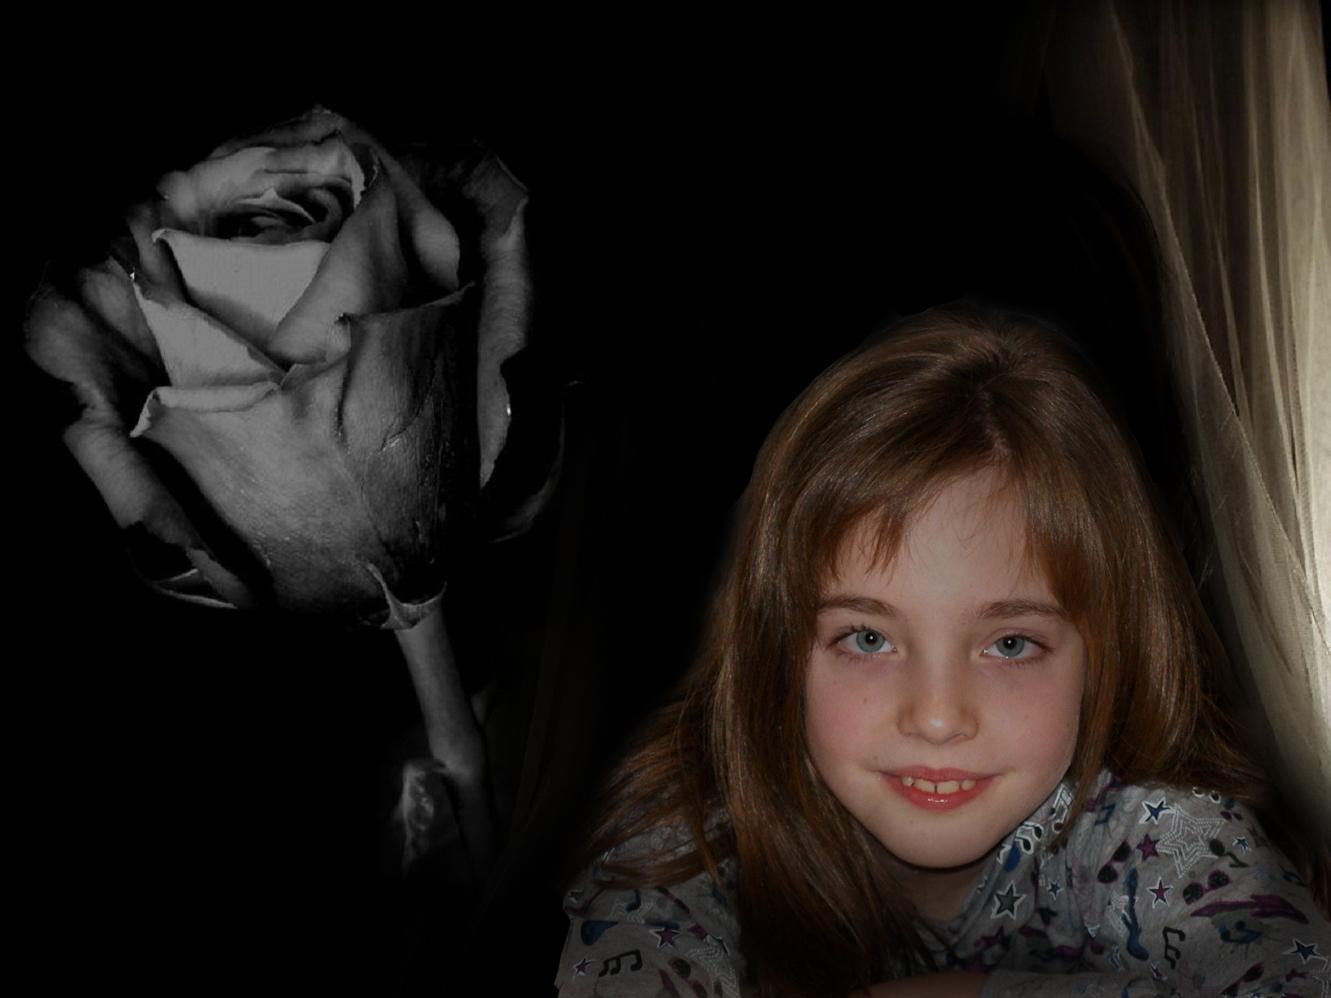 Carina with Rose